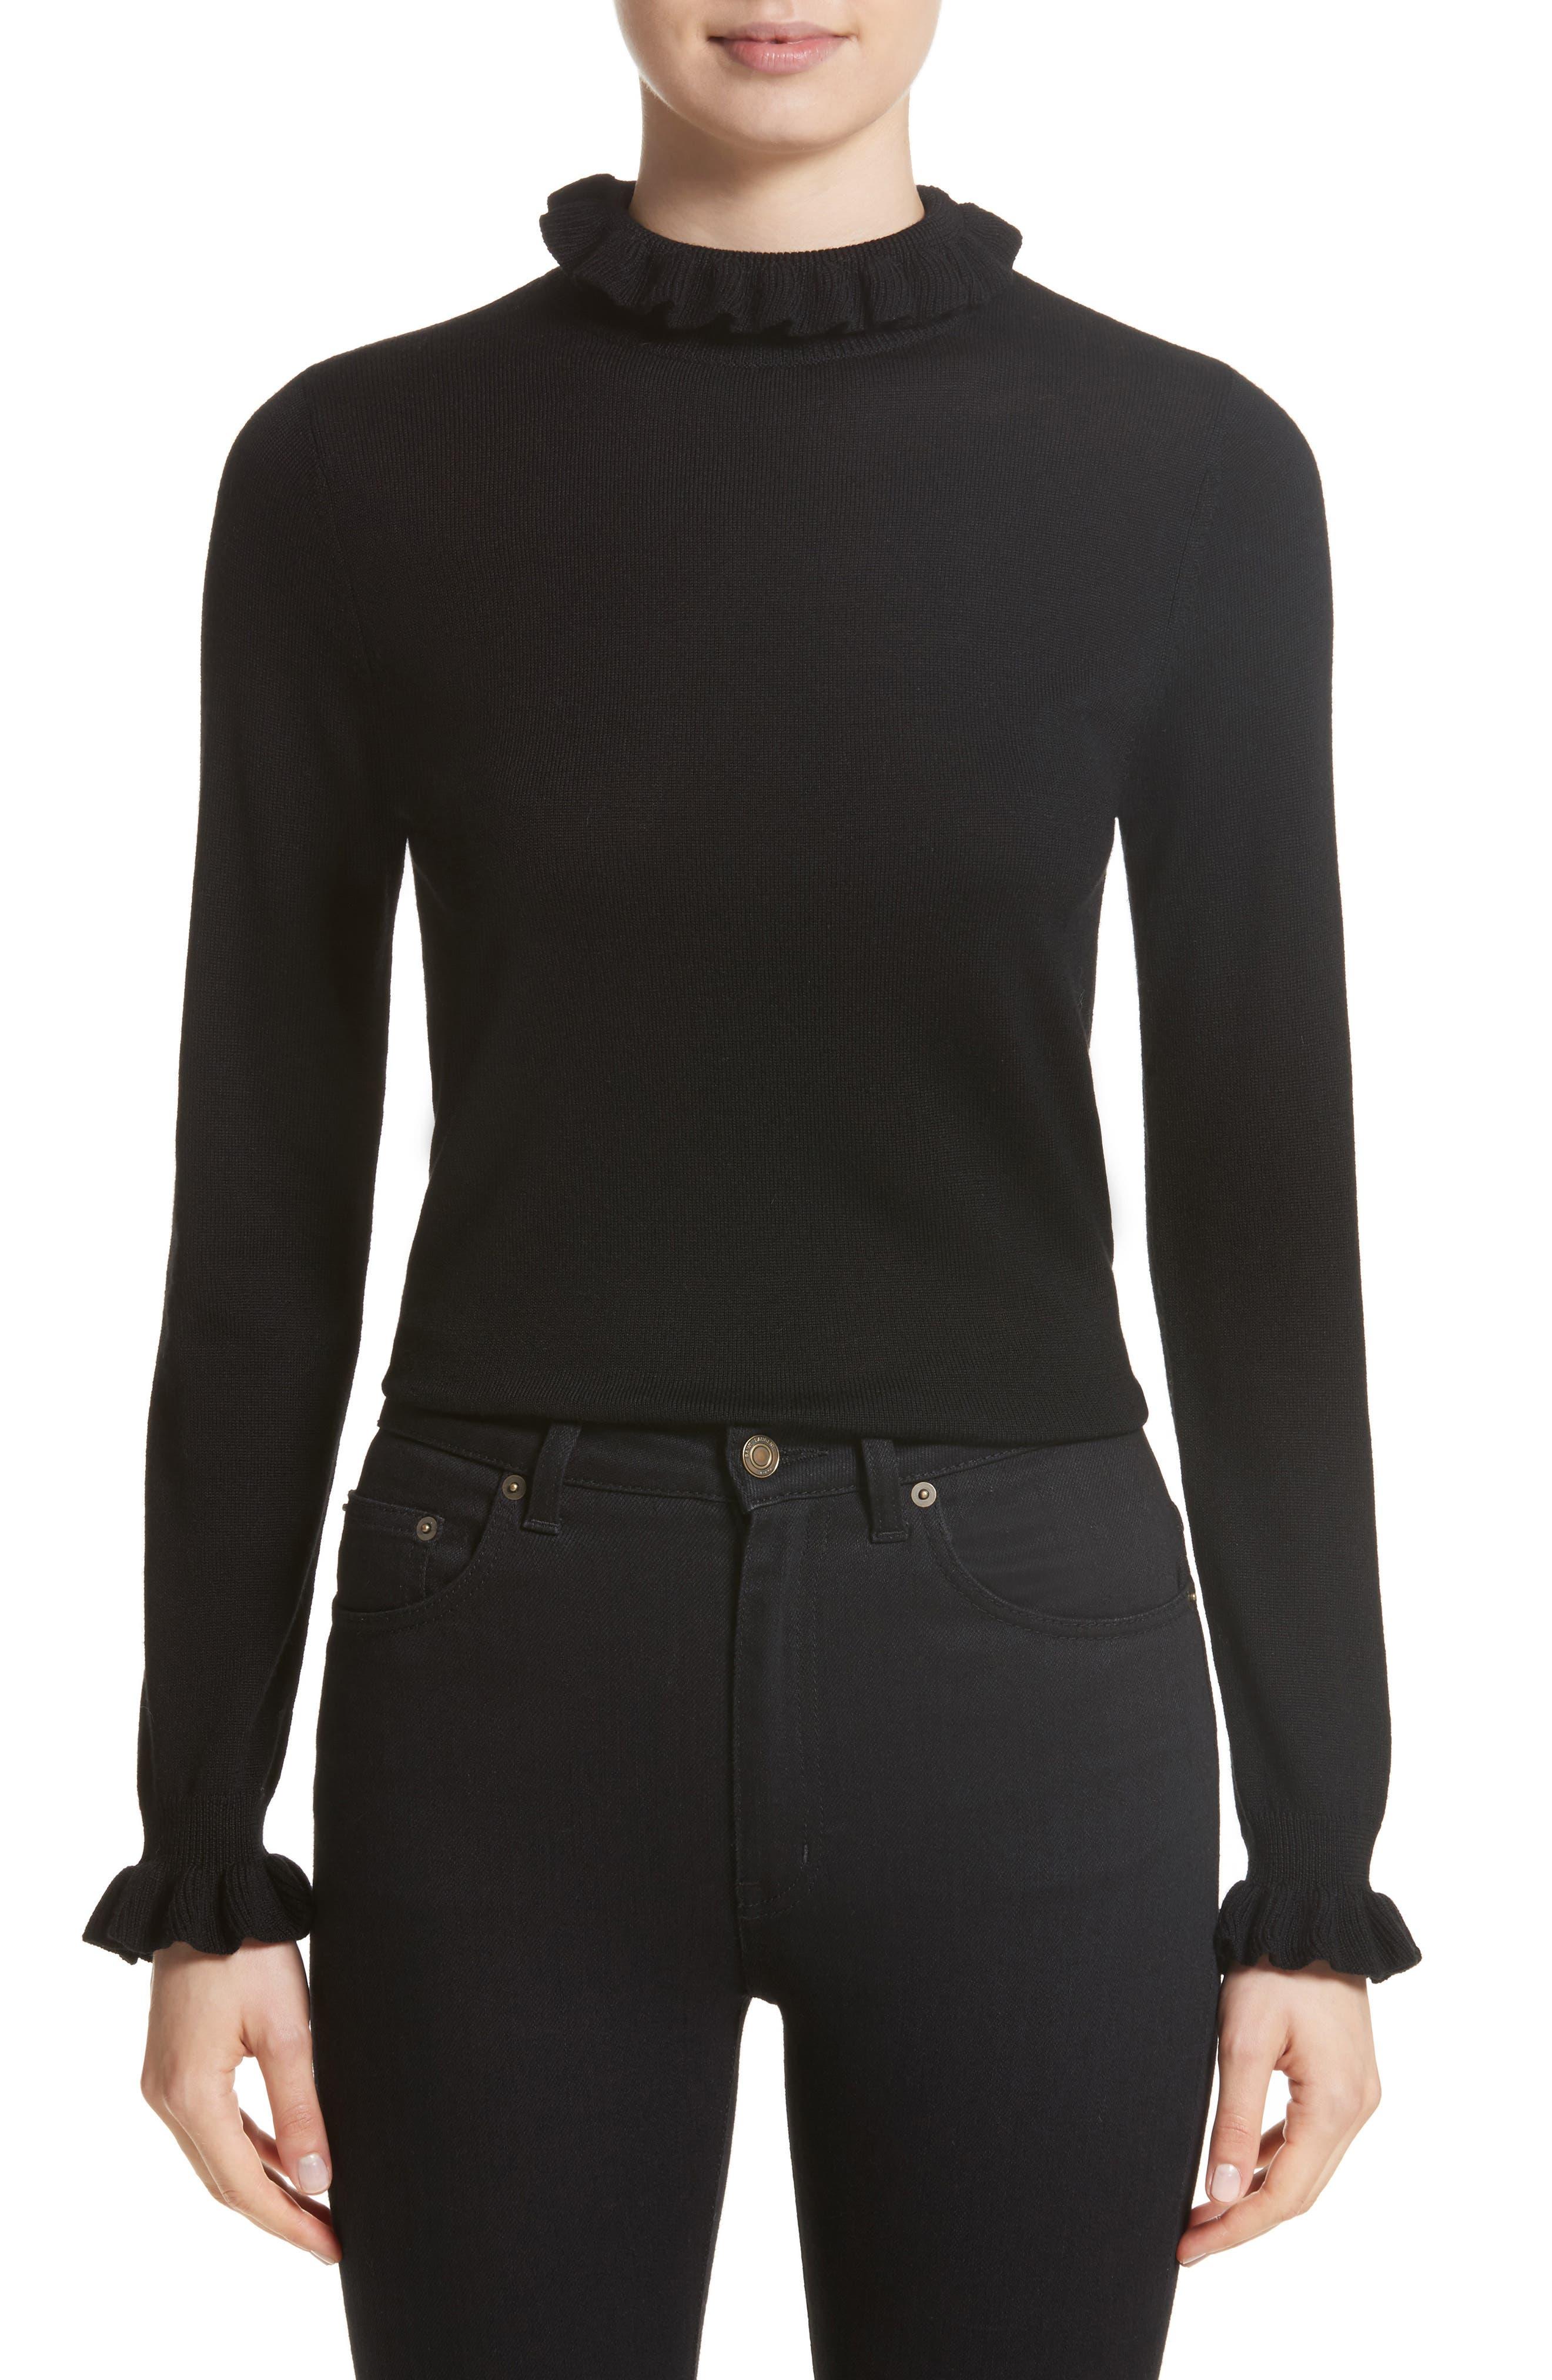 Robin Frill Wool Sweater,                         Main,                         color, Black